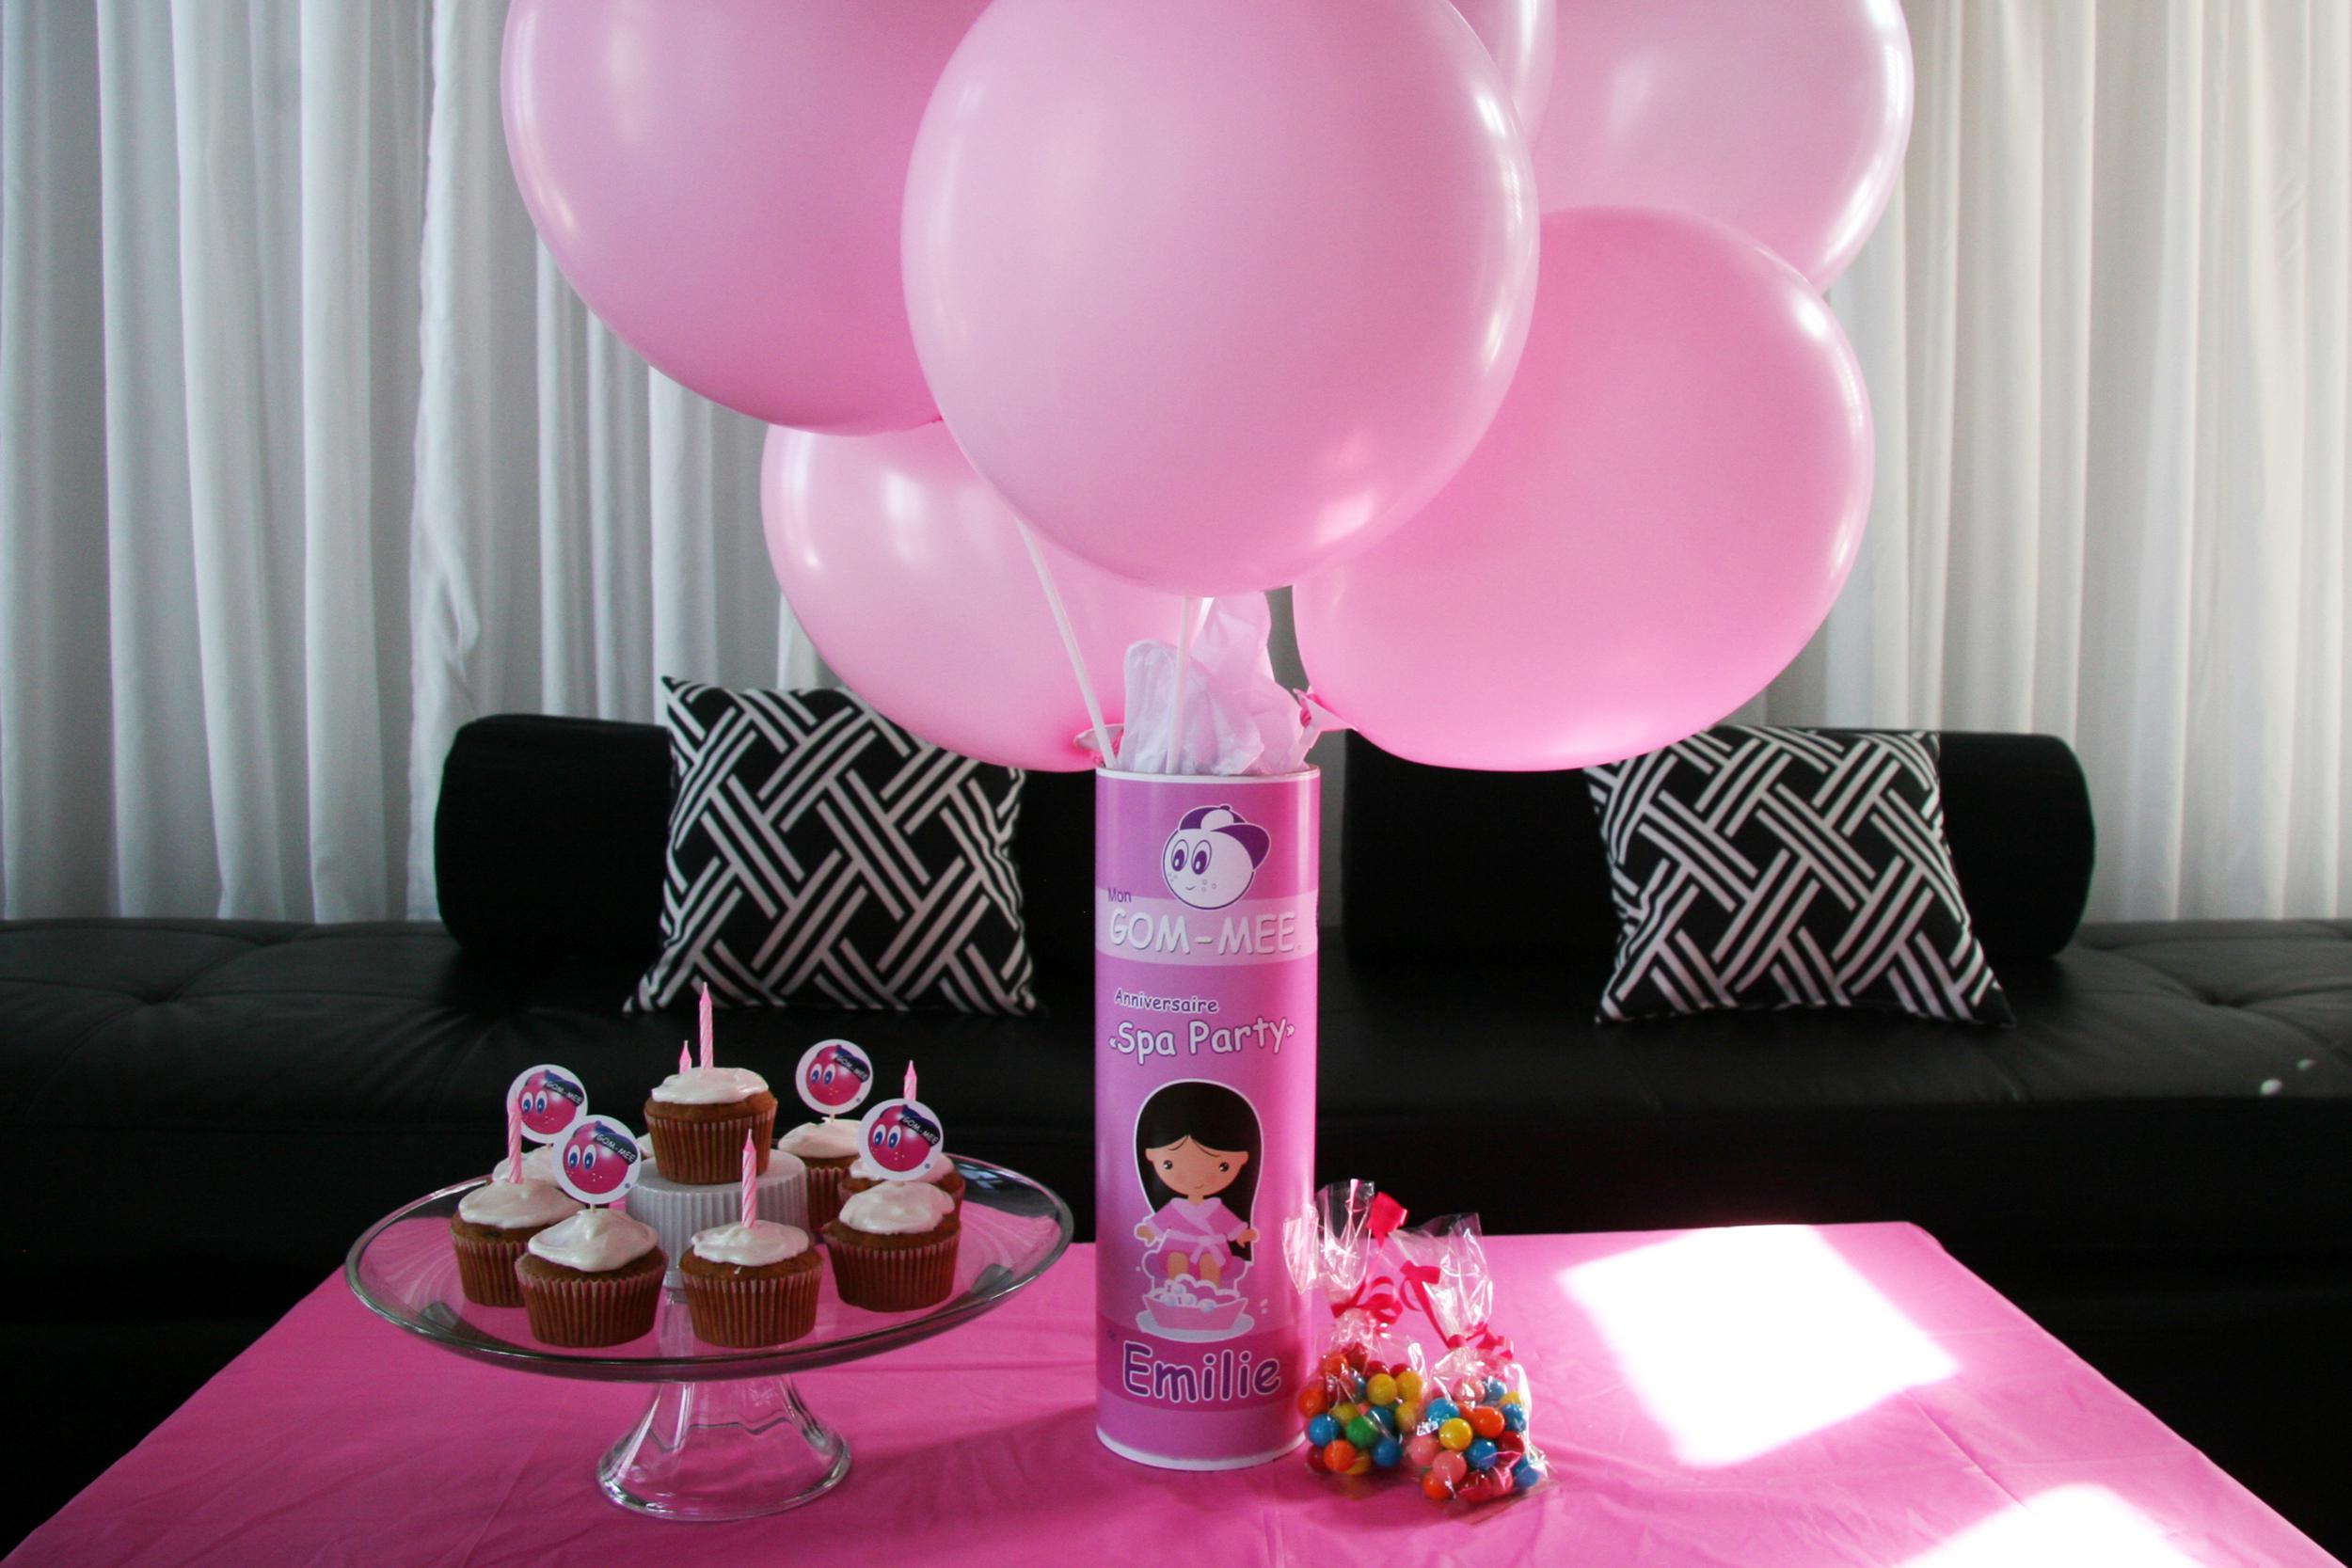 #Spa party GOM-MEE CAKE 2.jpg